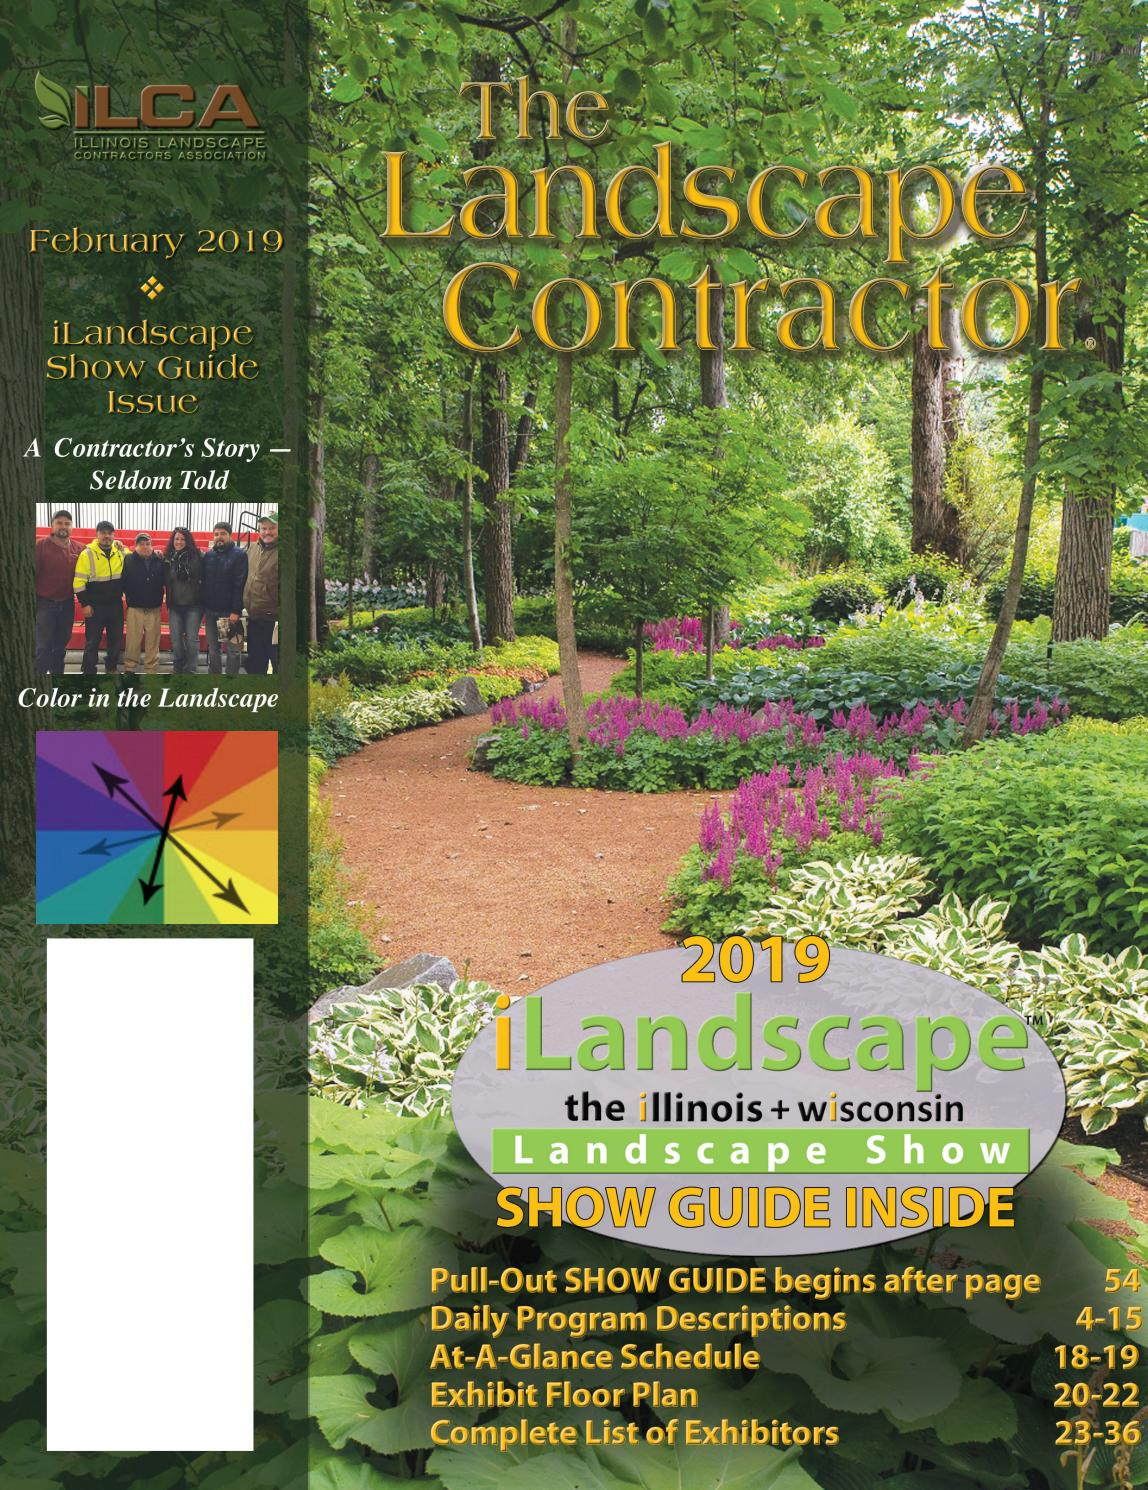 Feb 19 Tlc Digital Edition I Landscape Show Guide By Association